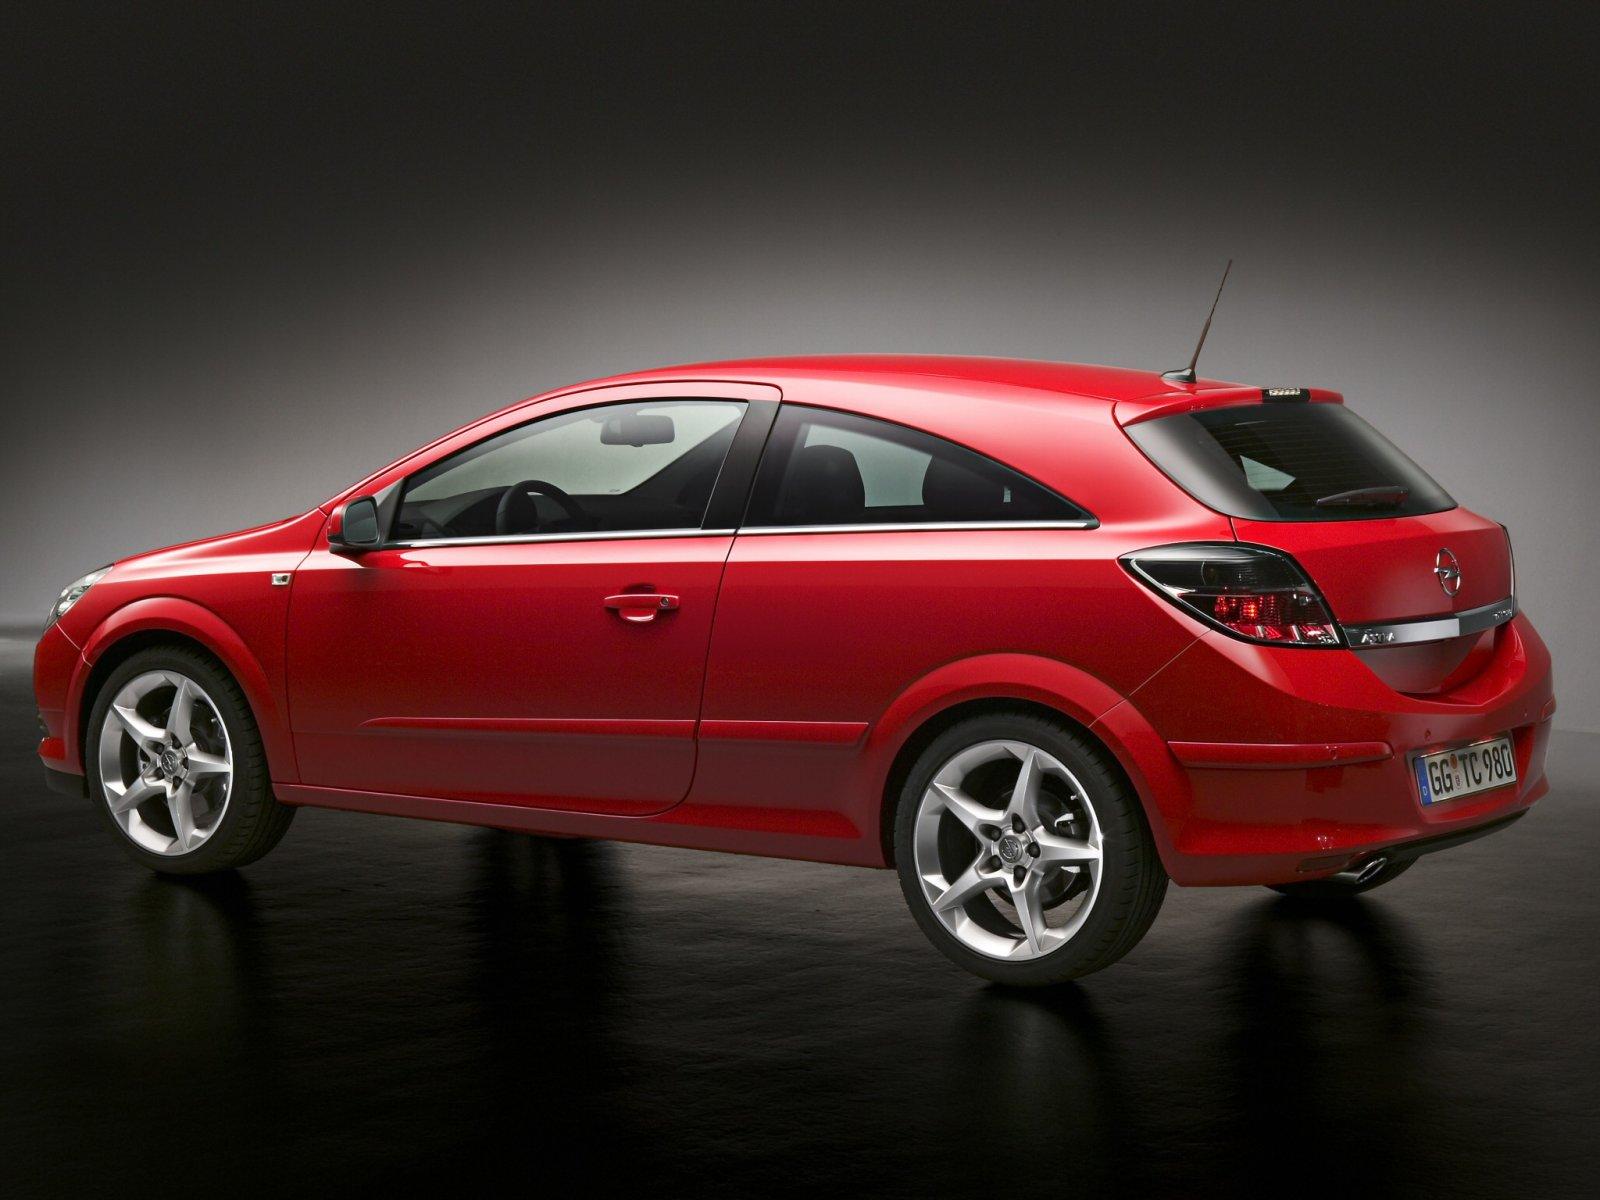 Opel Astra, Цены, Фото, Kартинки - Объявления Доска.ру.